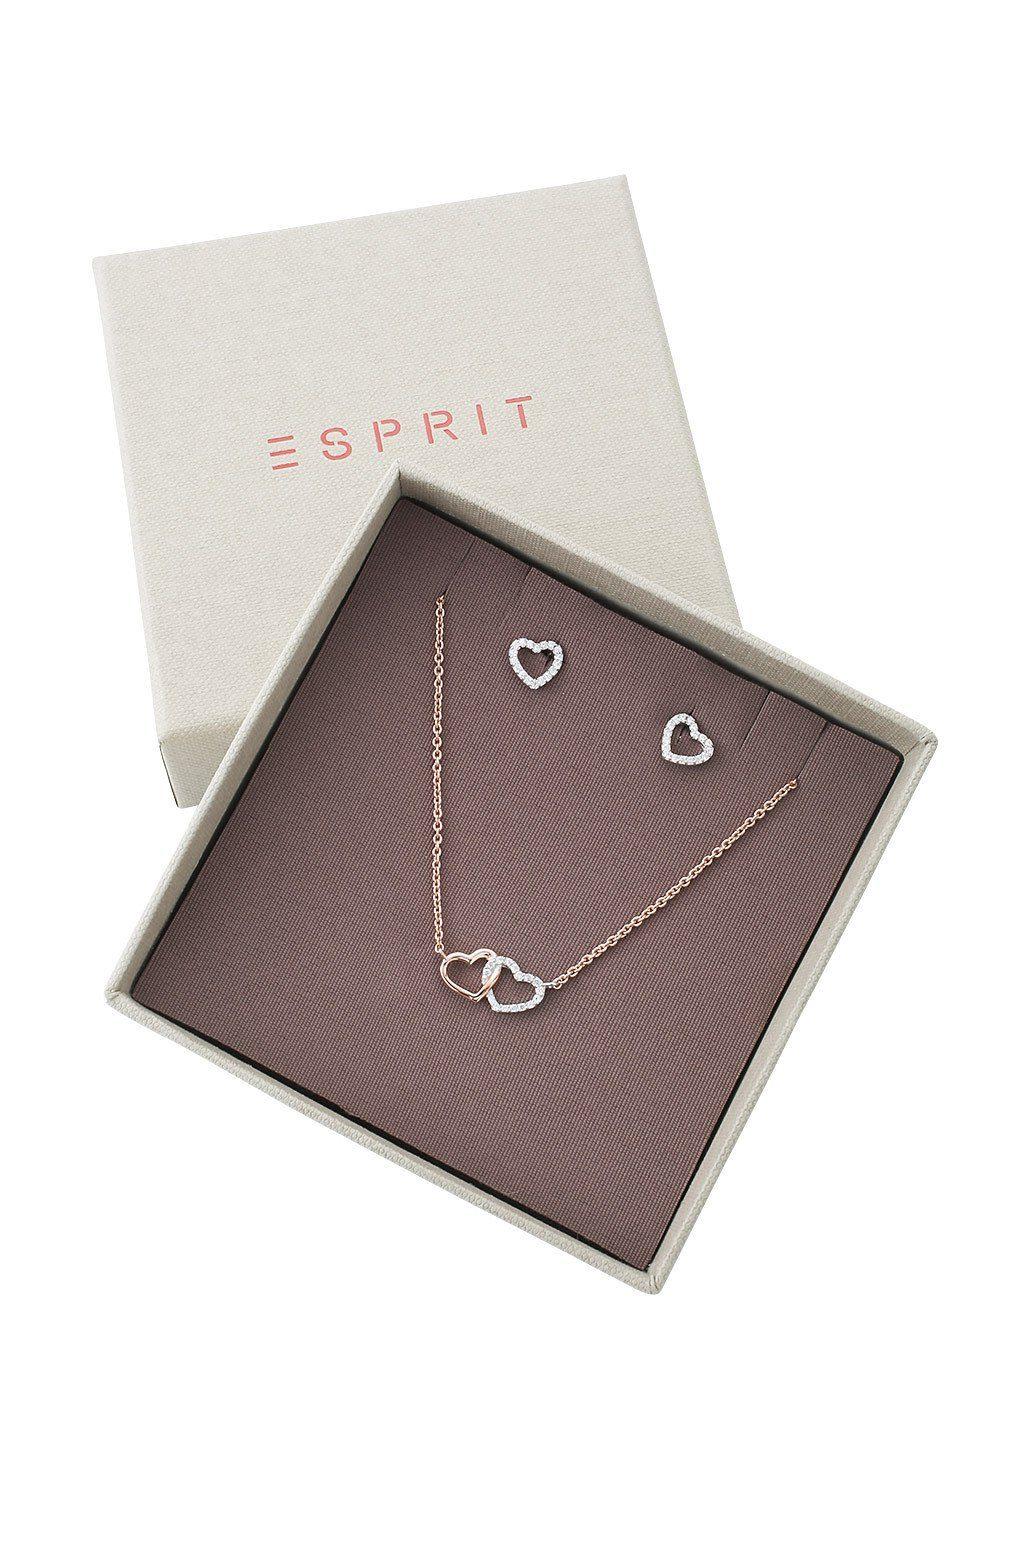 ESPRIT CASUAL Sterling Silber / Rotgoldplattierung /Zirkonia